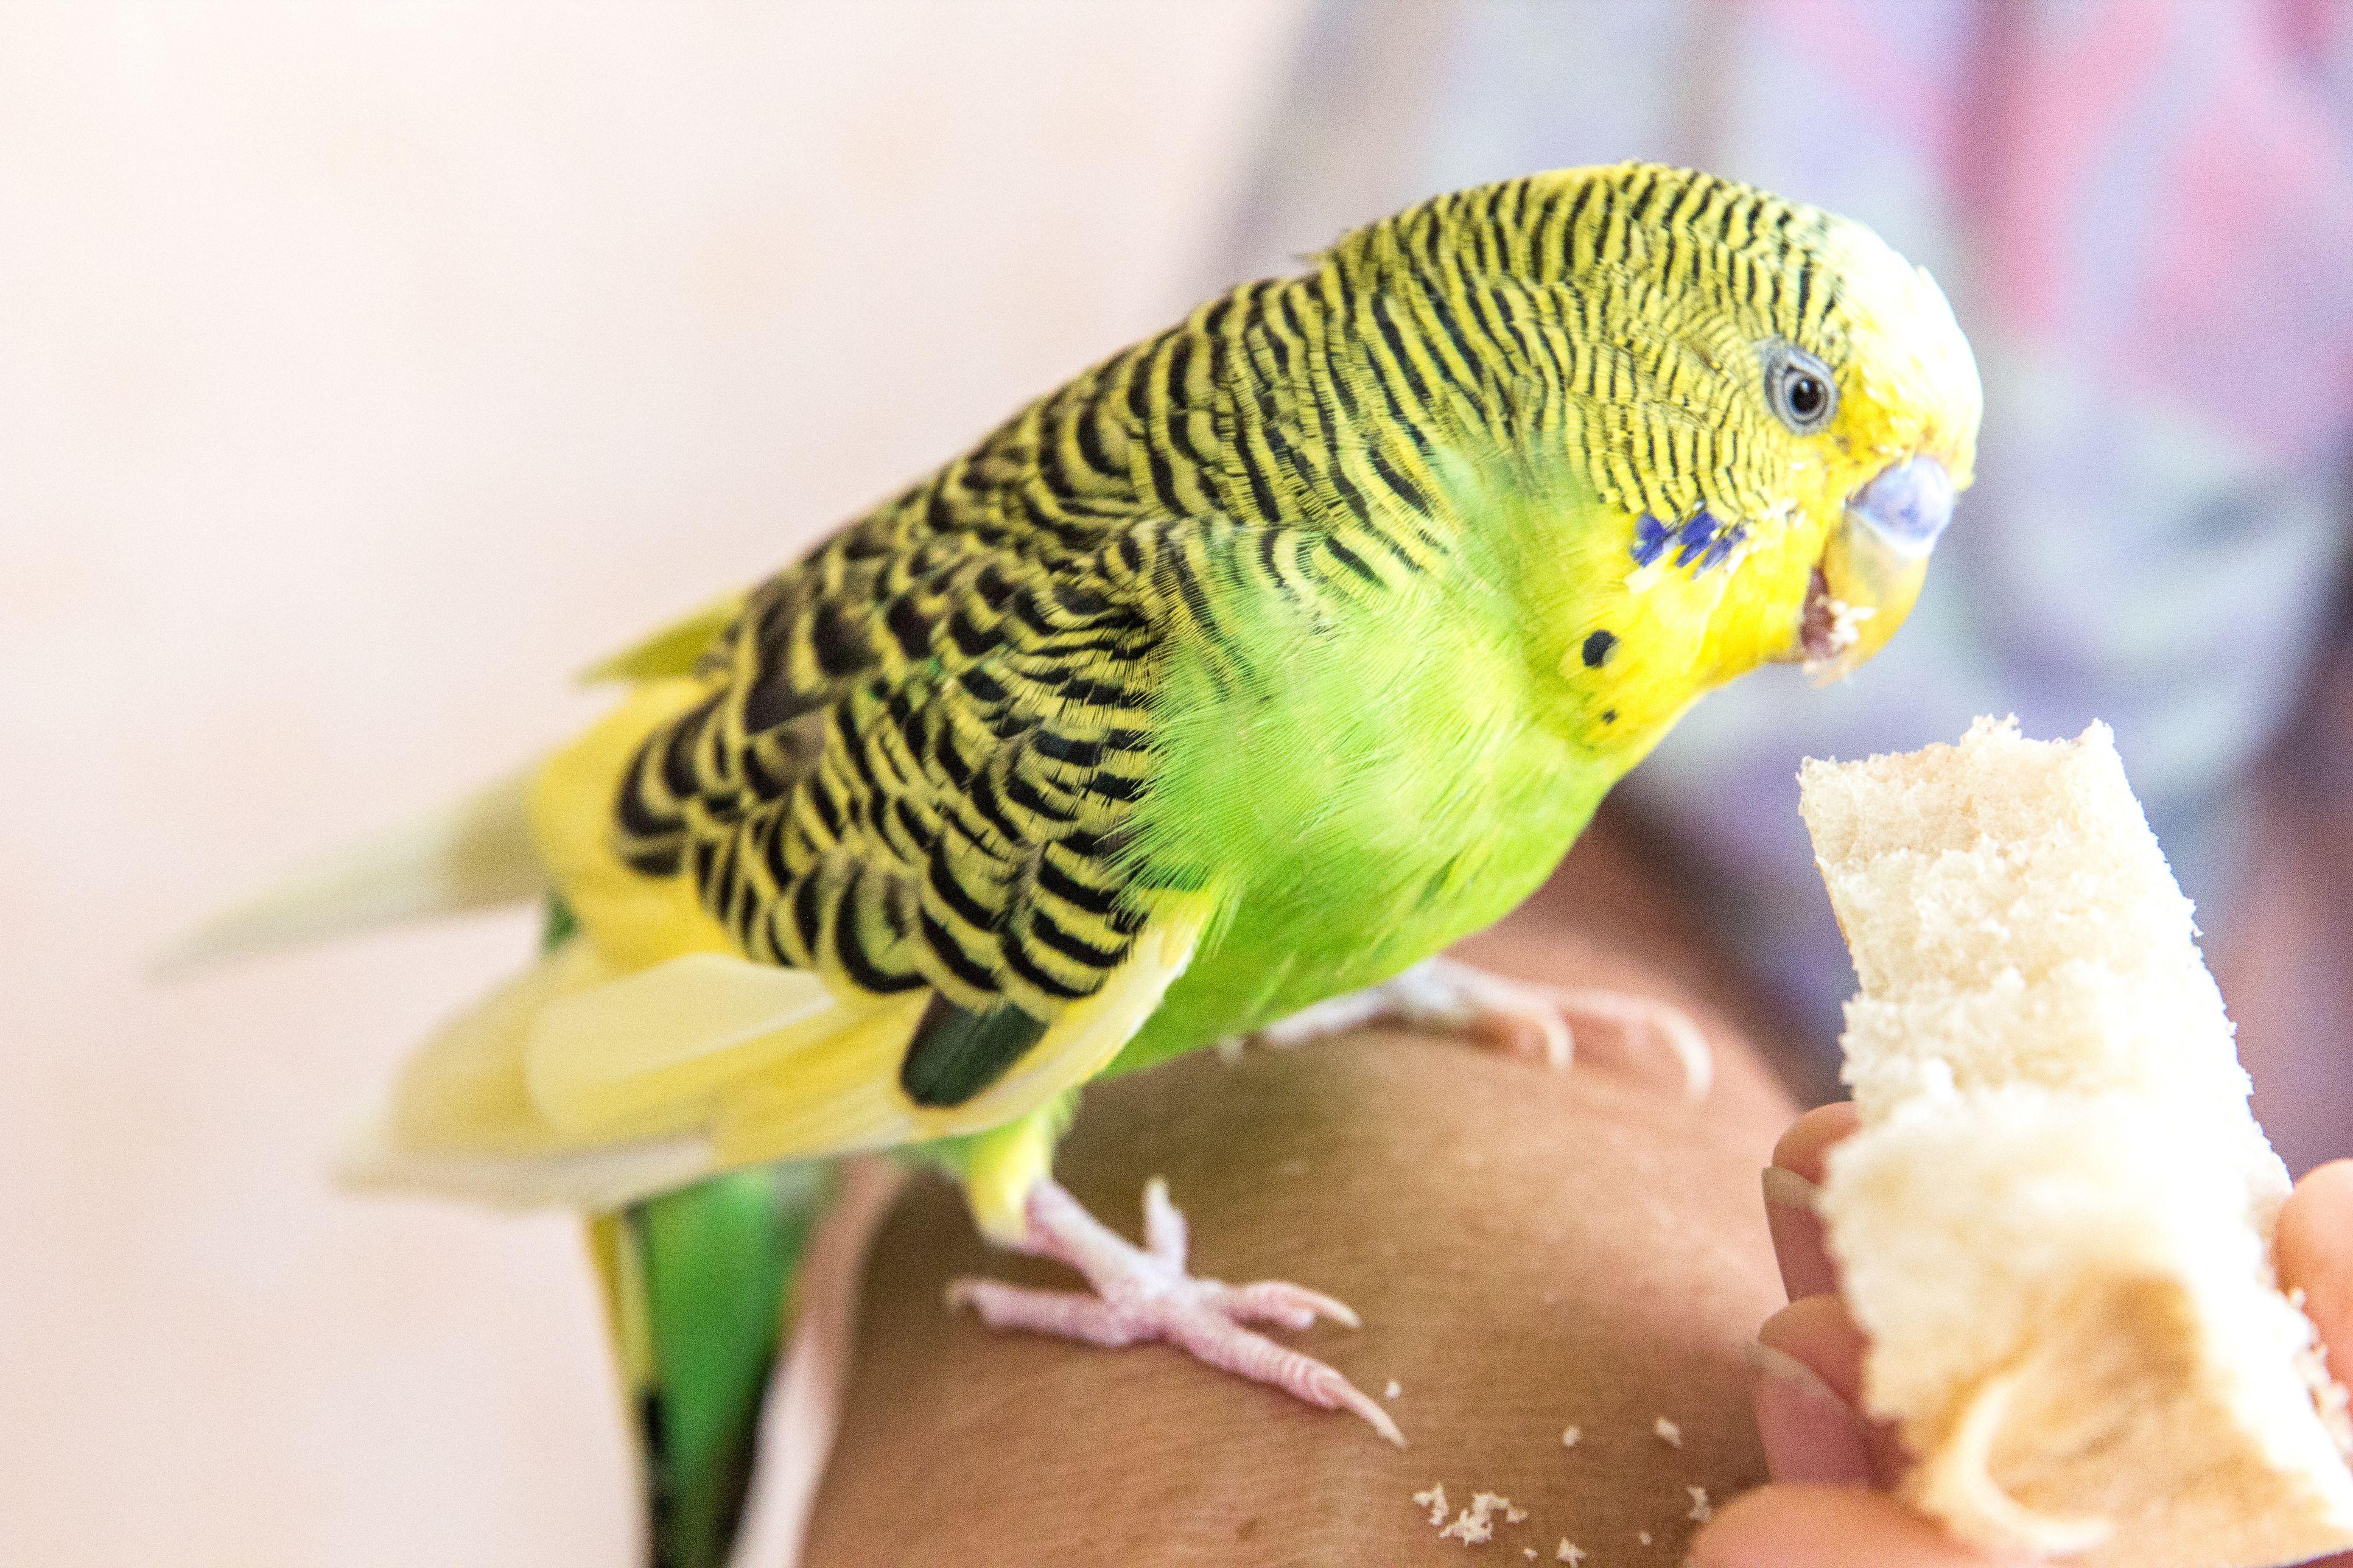 Green parrot eating bread